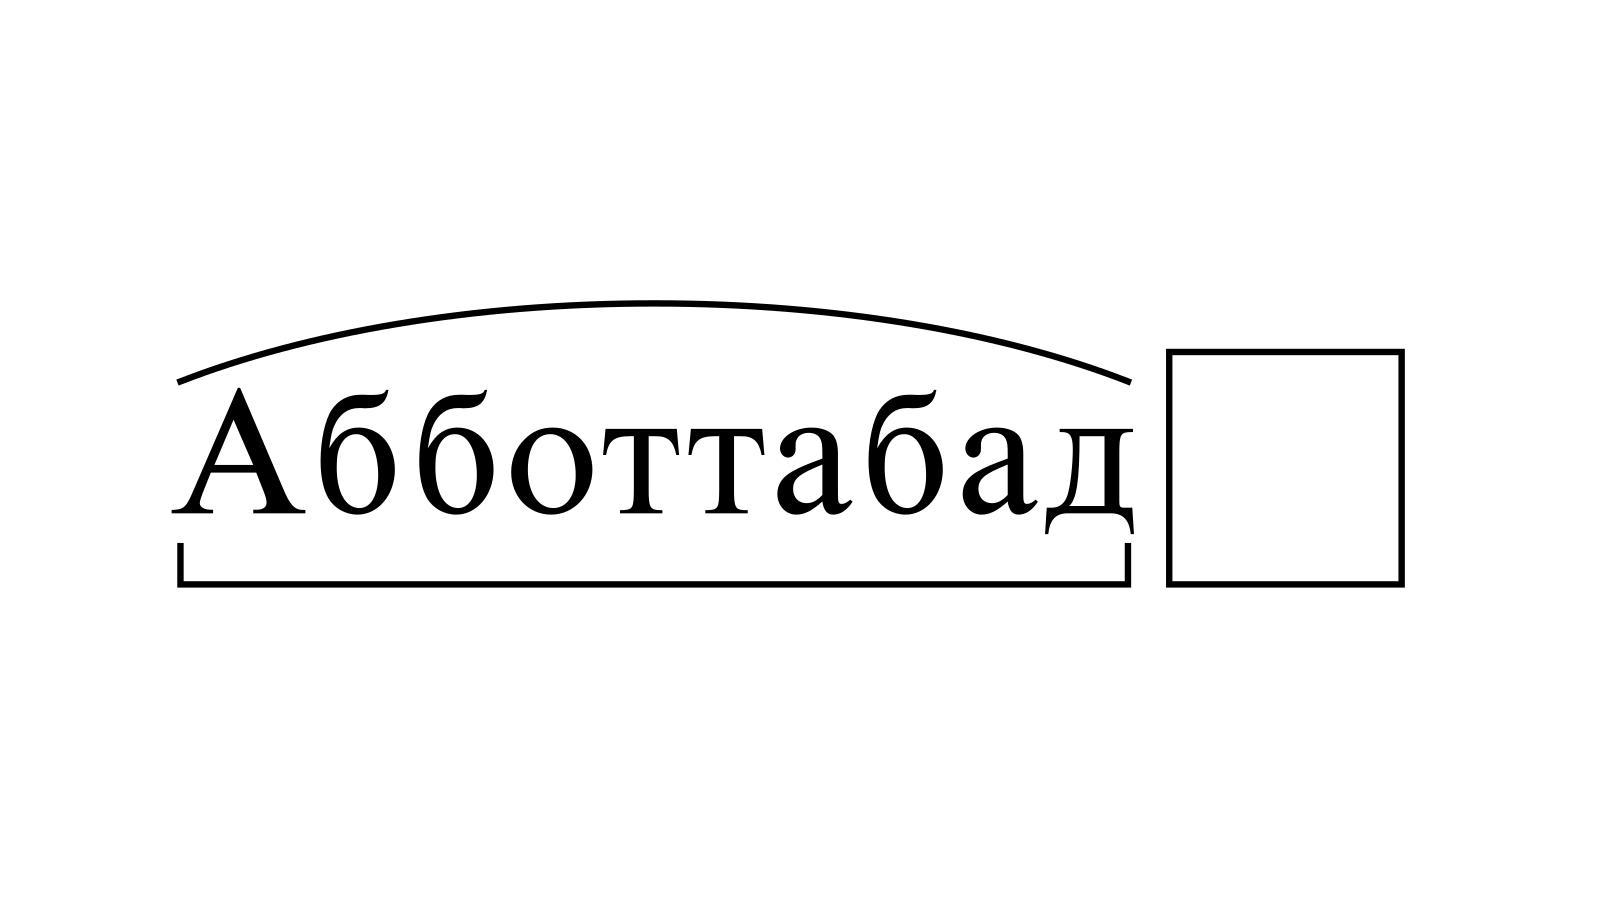 Разбор слова «Абботтабад» по составу